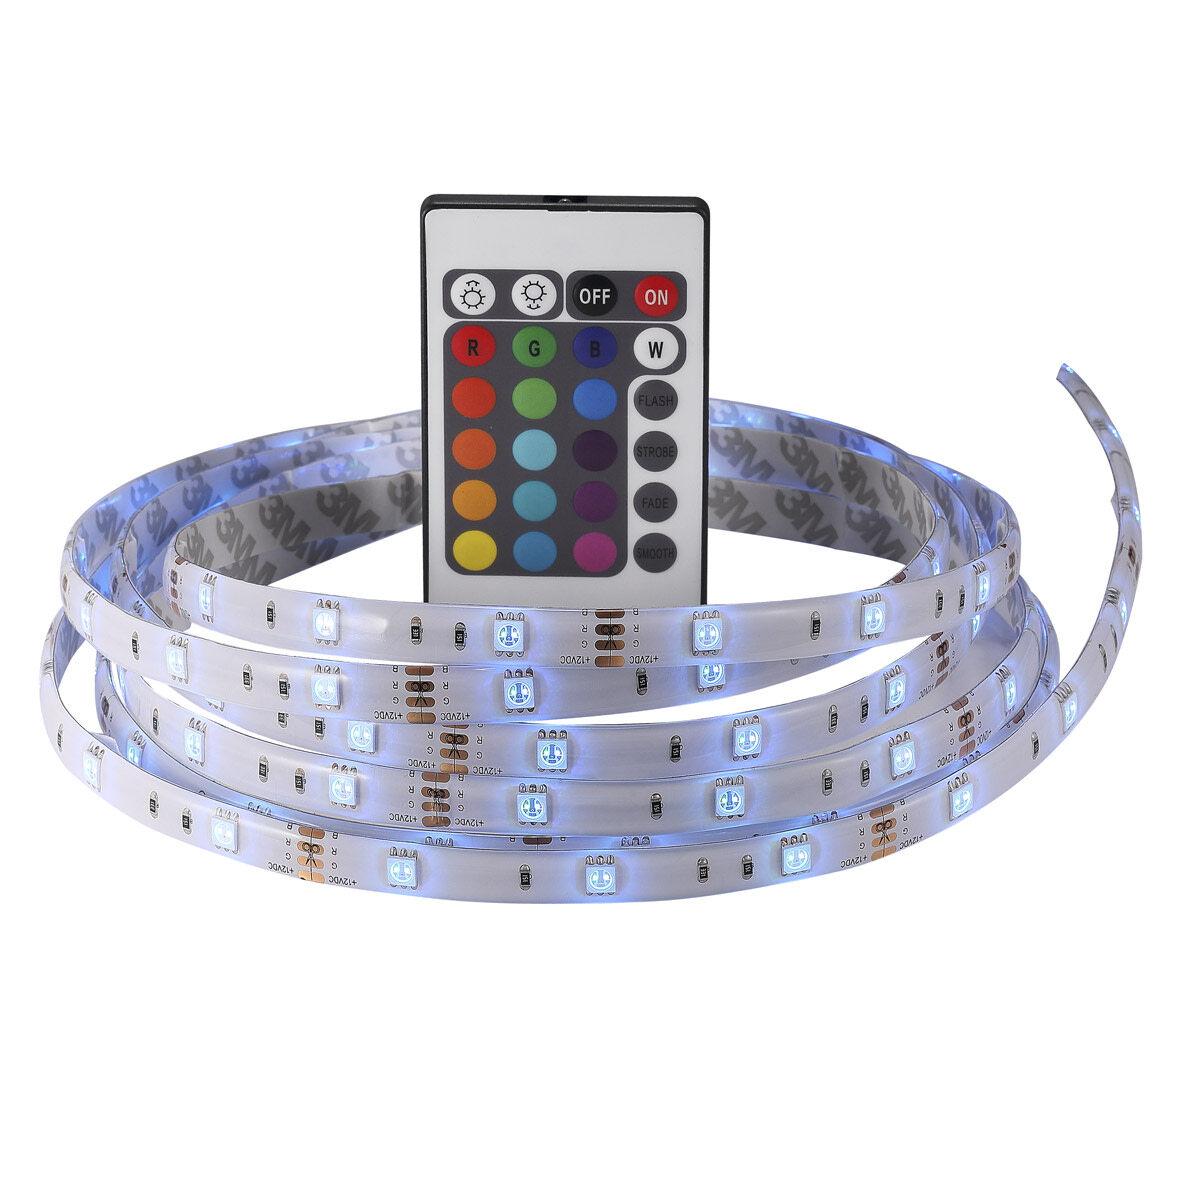 Nordlux Nimba RGB 3 m leikattava LED-nauha